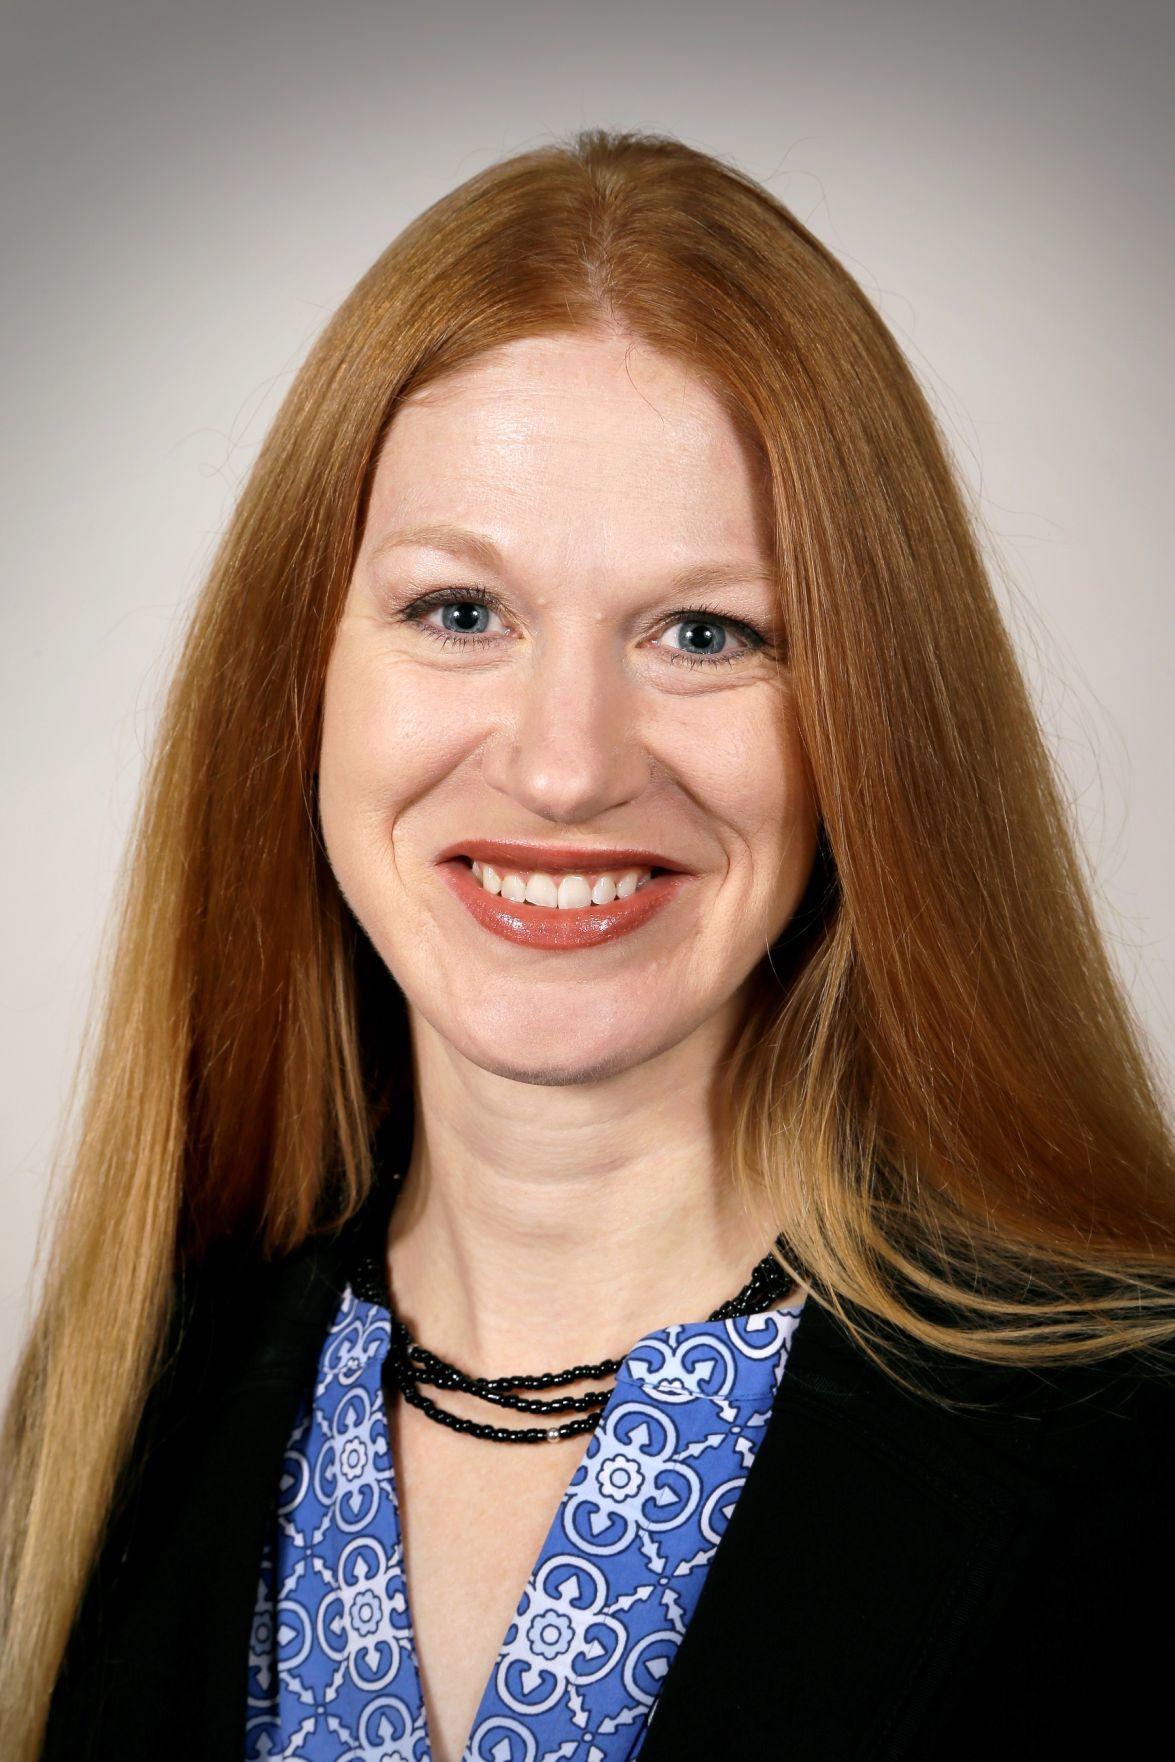 Iowa state Sen. Amy Sinclair